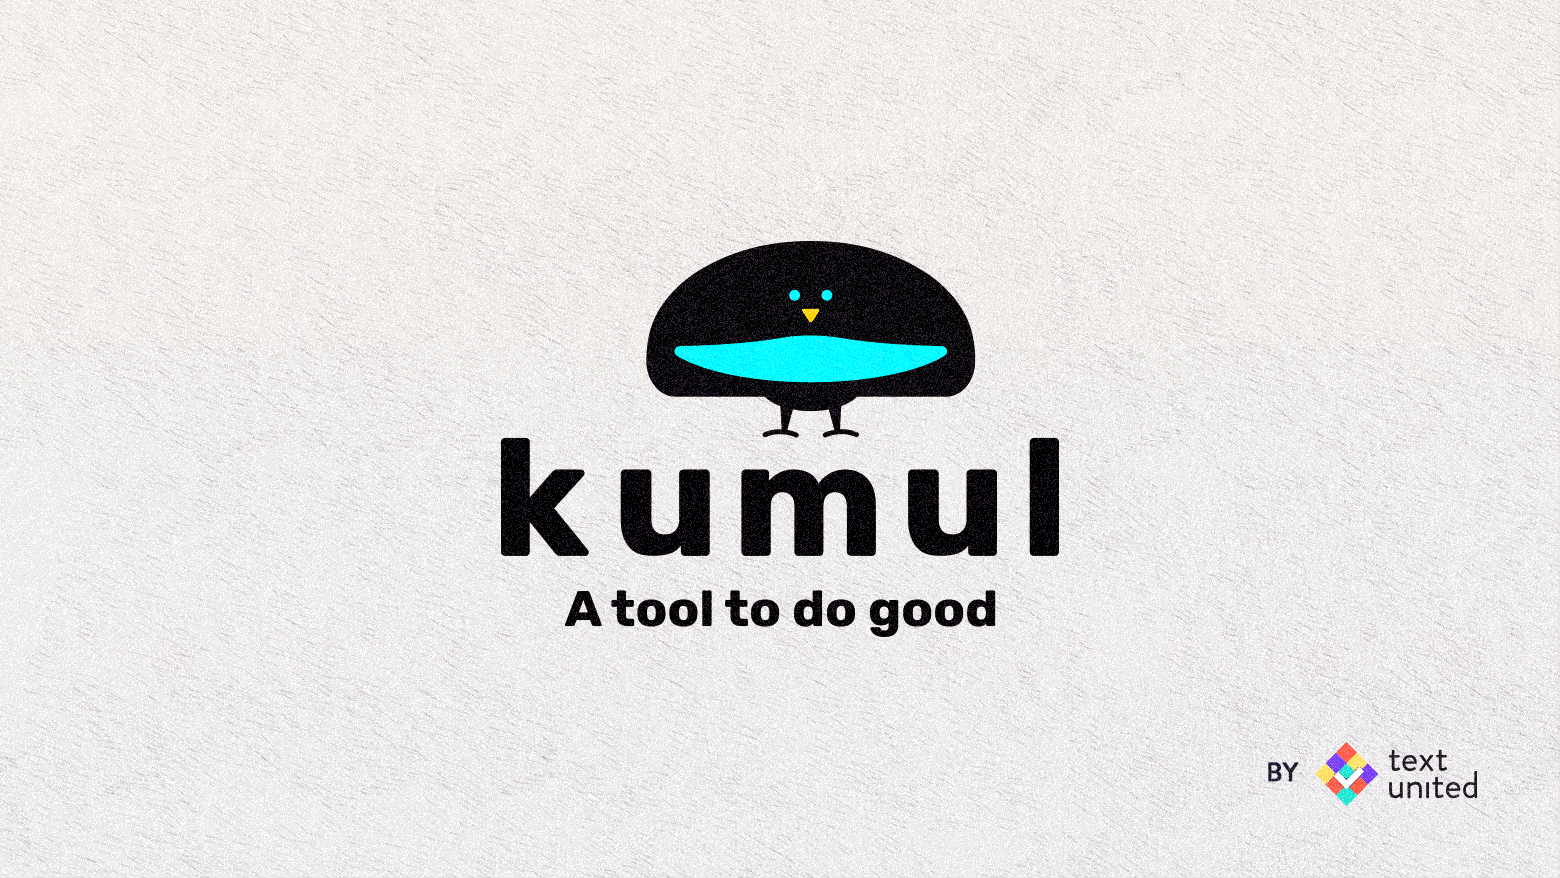 Text United Presents Kumul: The Ultimate Mulitlingual CX Platform